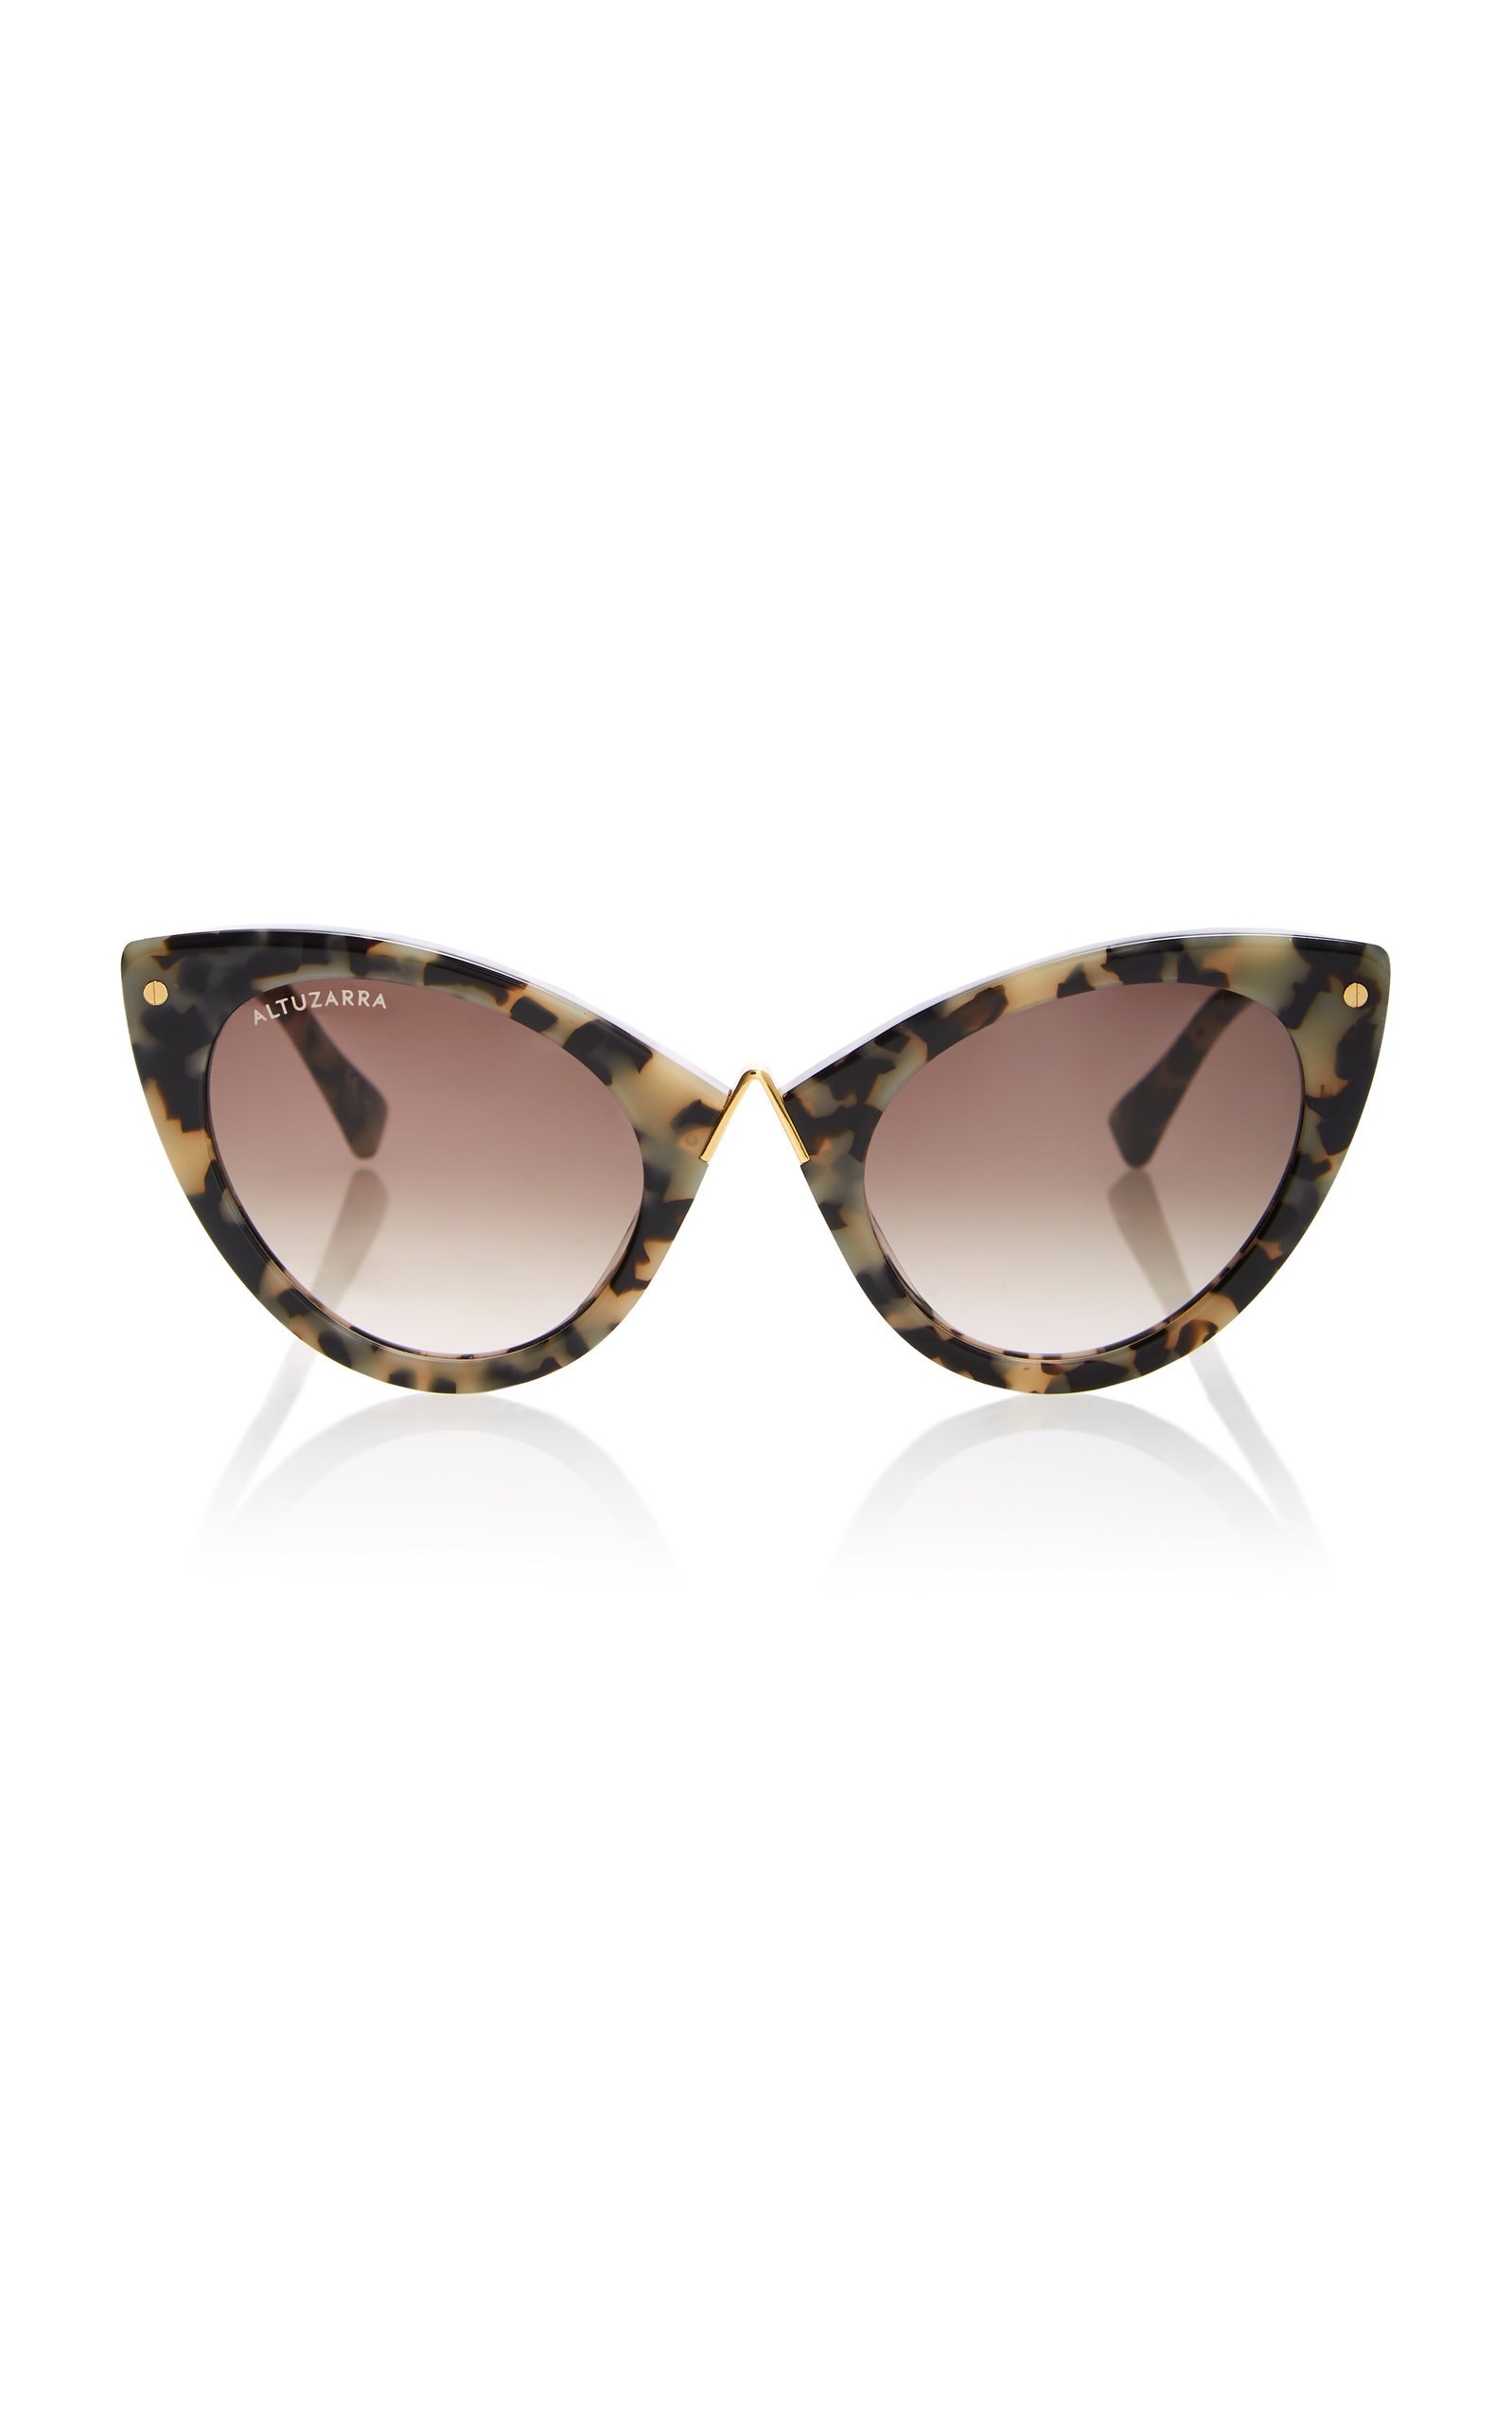 ALTUZARRA SUNGLASSES Tortoiseshell Acetate Cat-Eye Sunglasses in Black